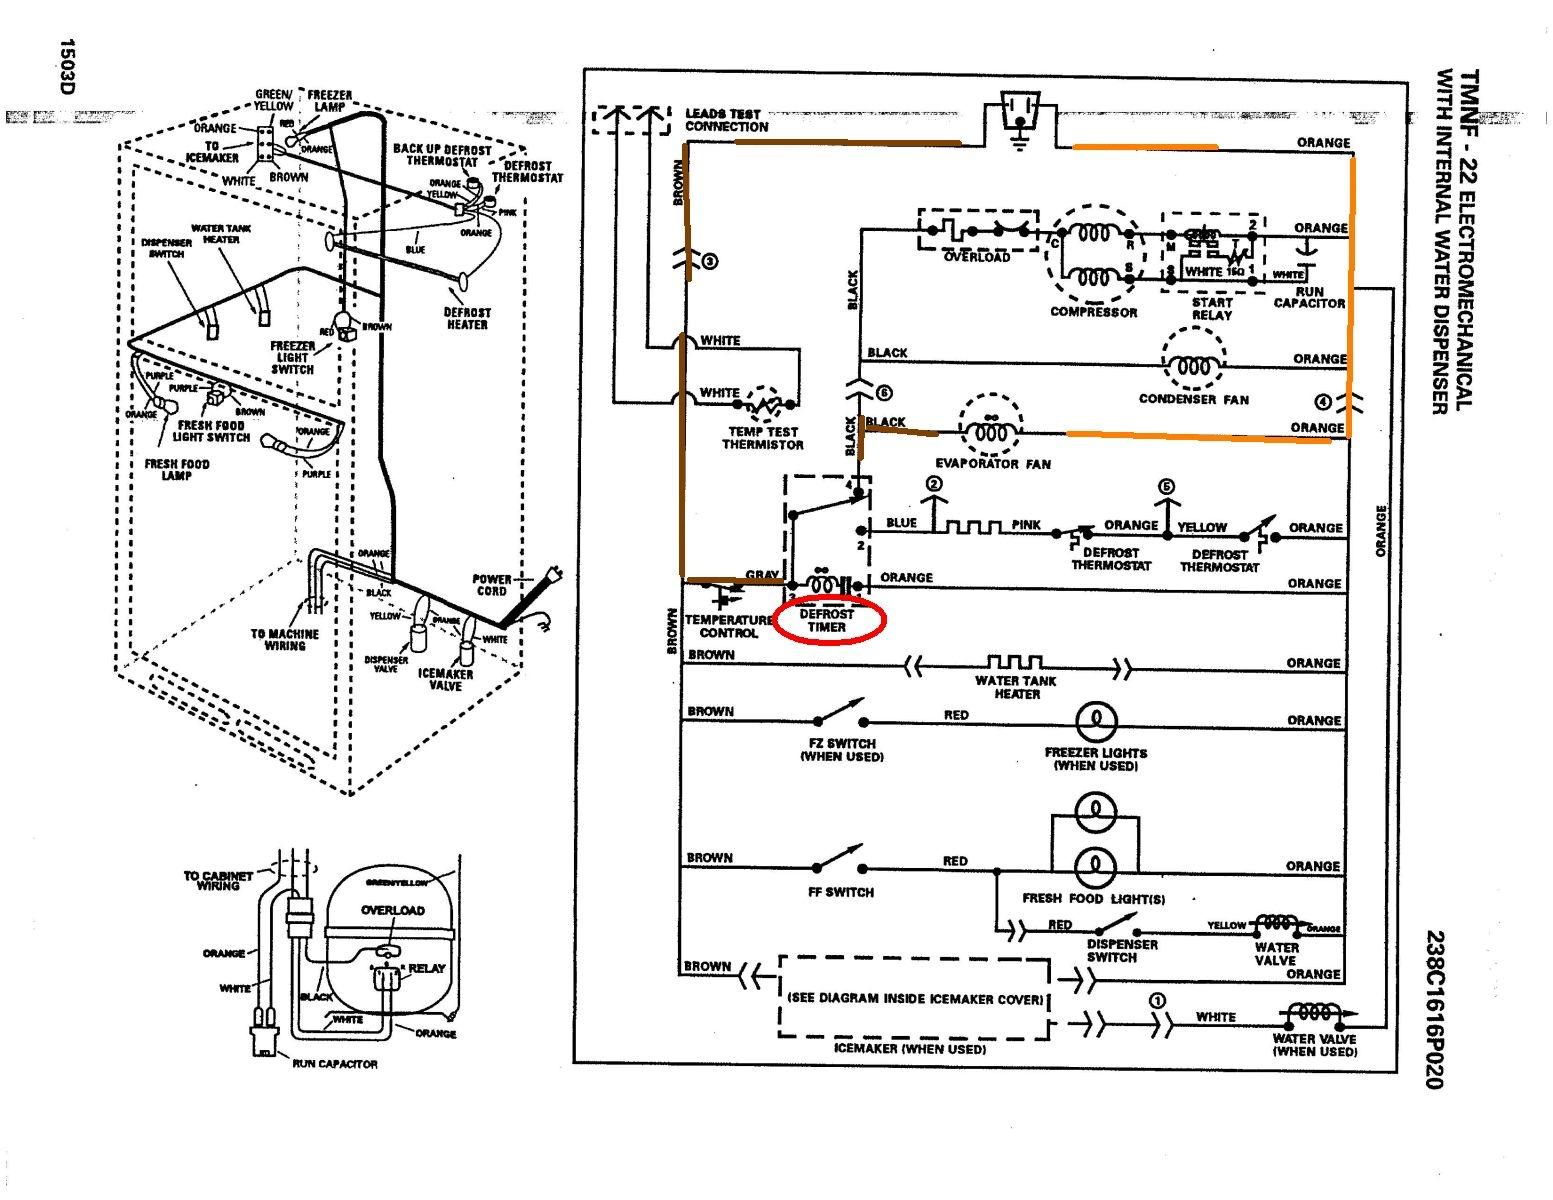 hight resolution of ge tbx21j refrigerator wiring diagram schema wiring diagram wiring diagram maytag fridge